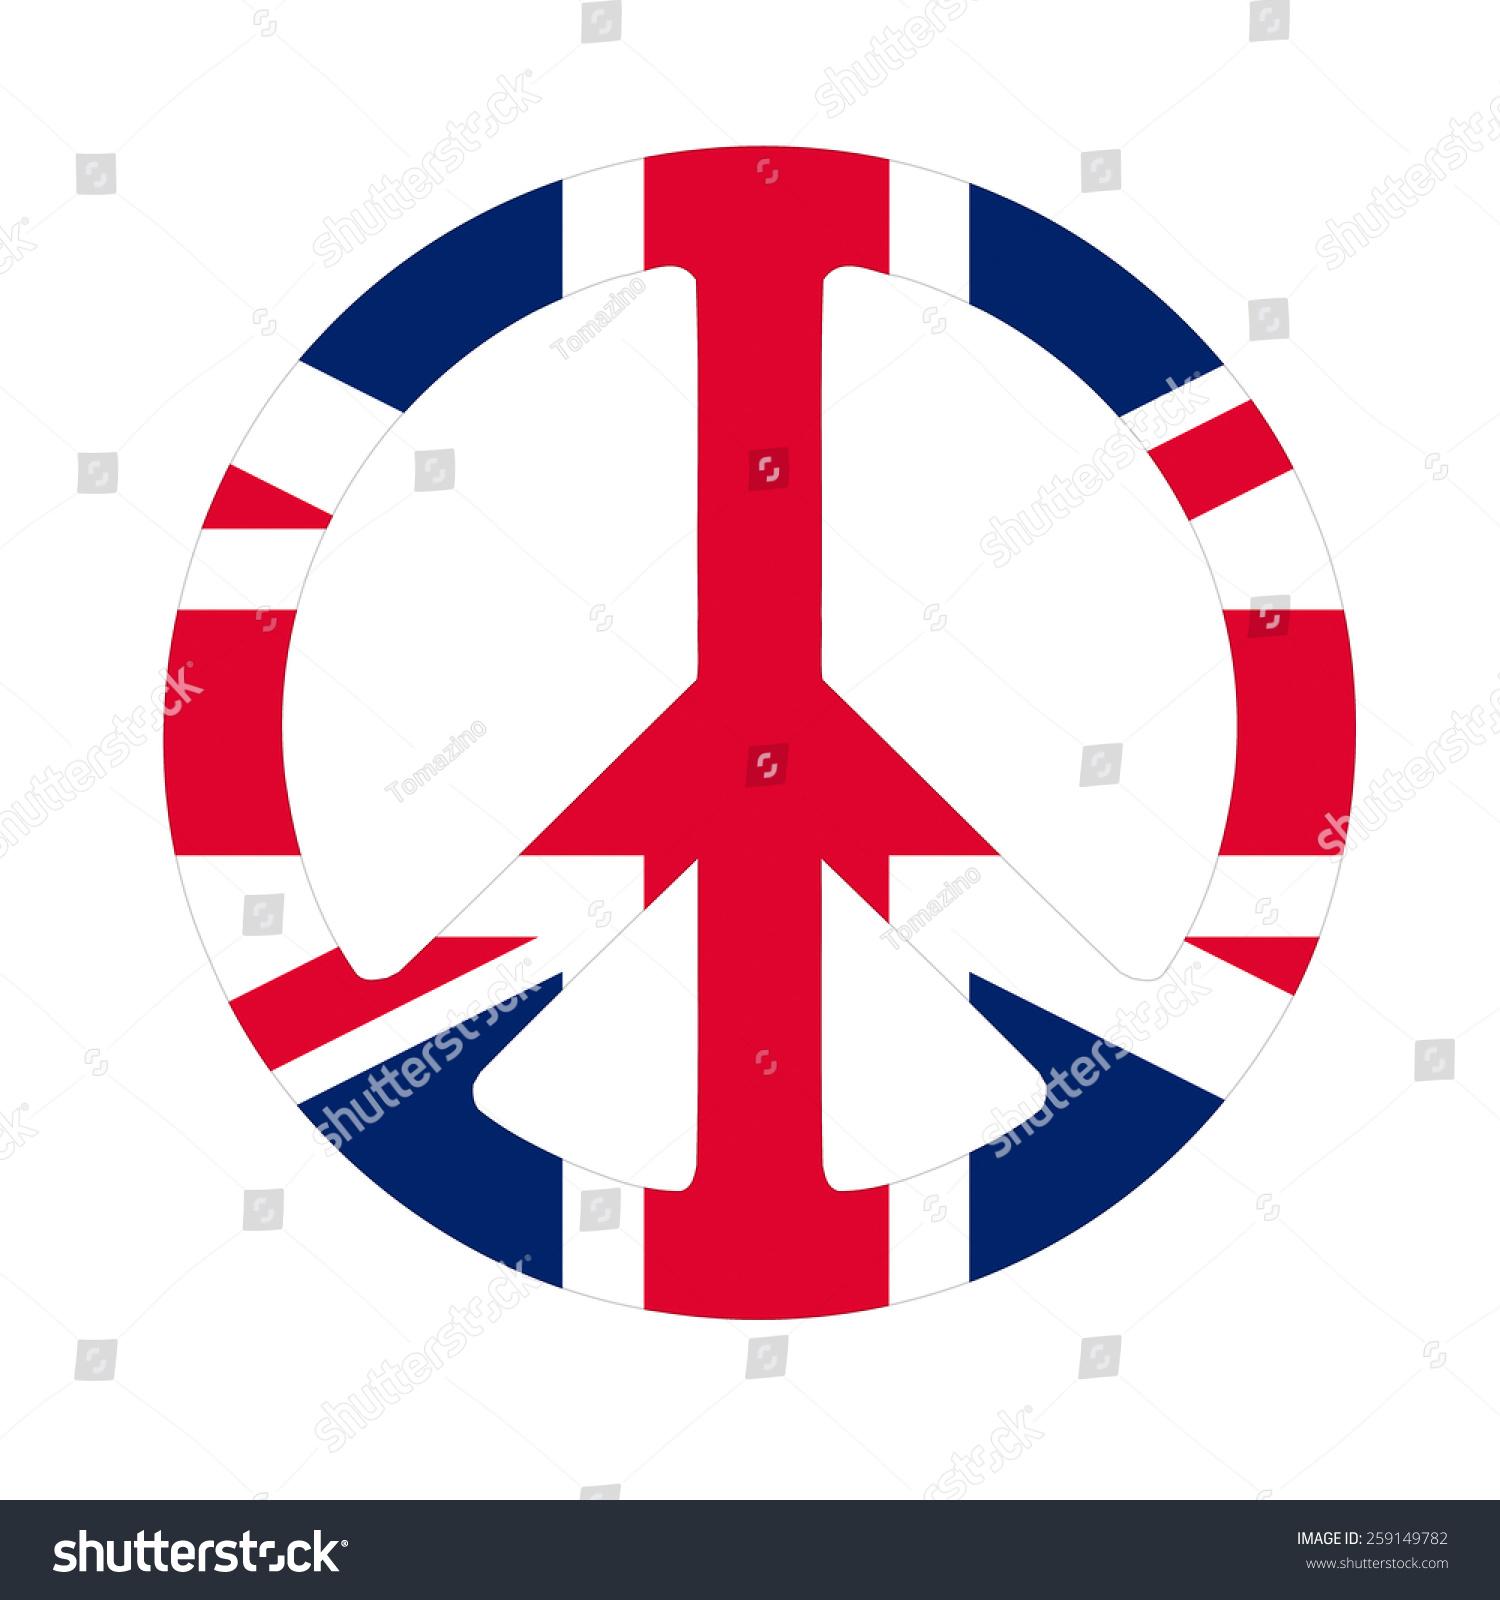 Great britain peace symbol flag stock illustration 259149782 great britain peace symbol flag biocorpaavc